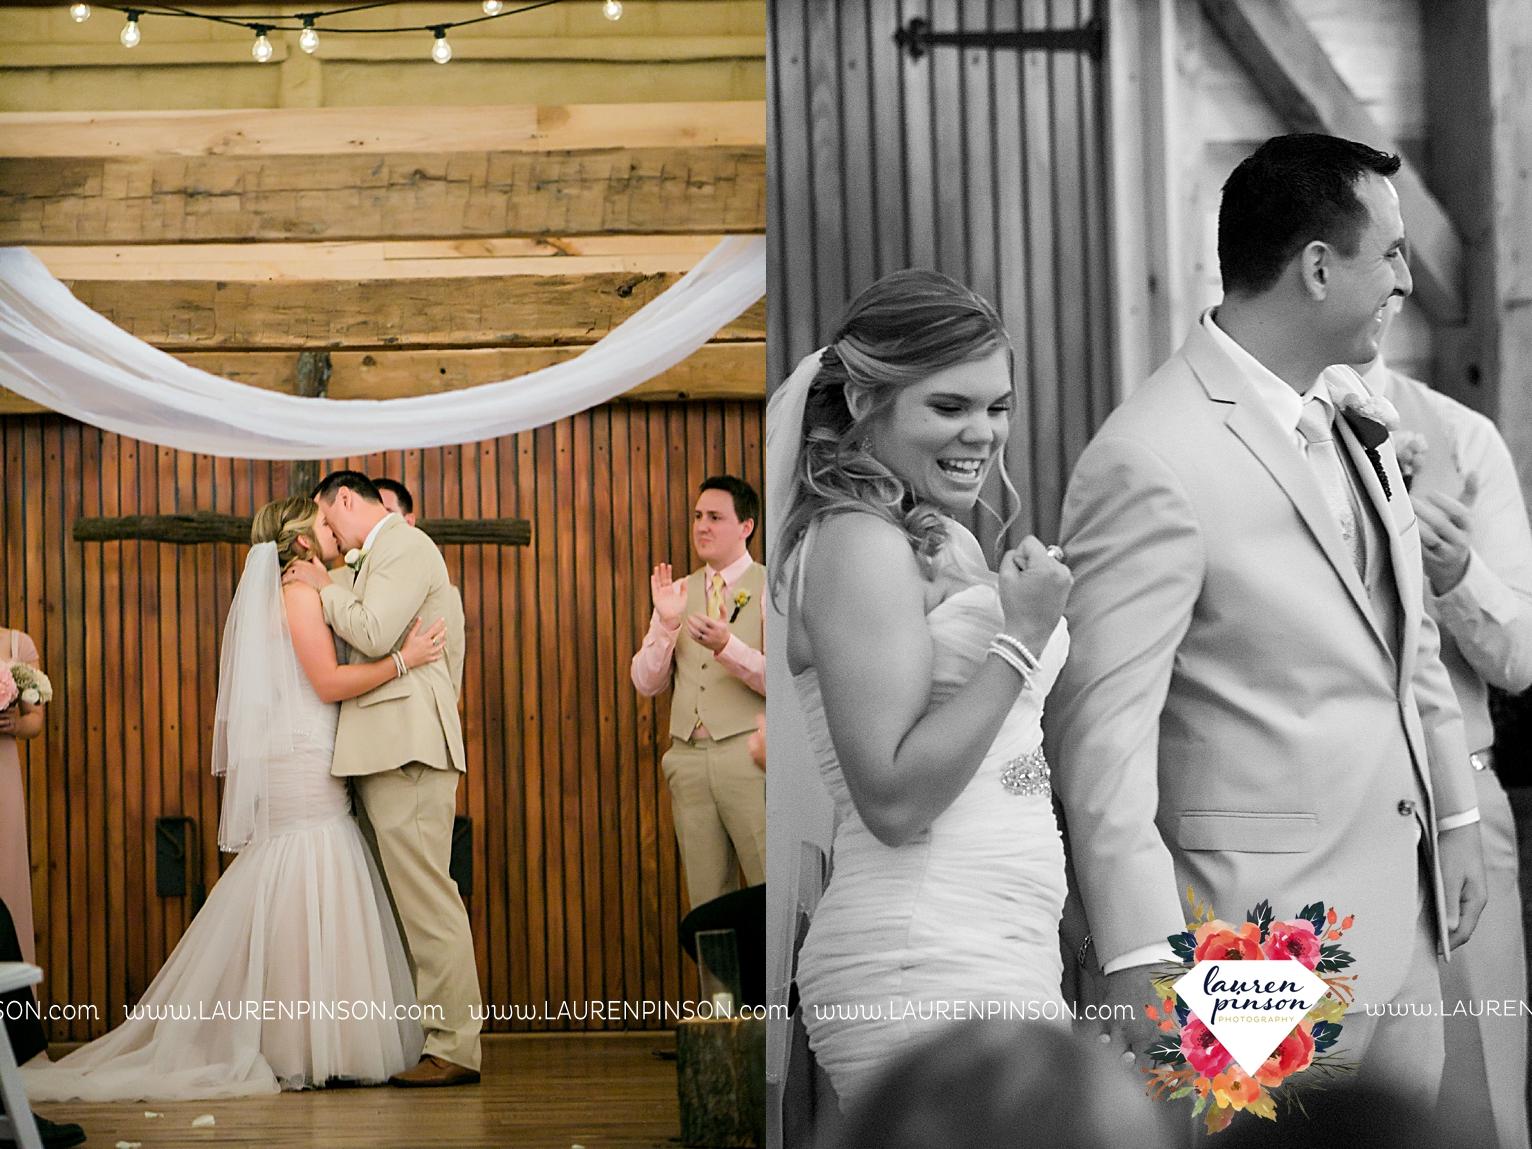 weatherford-texas-hollow-hill-farm-event-wedding-mineral-wells-dfw-wedding-photographer-wichita-falls-photography_3165.jpg